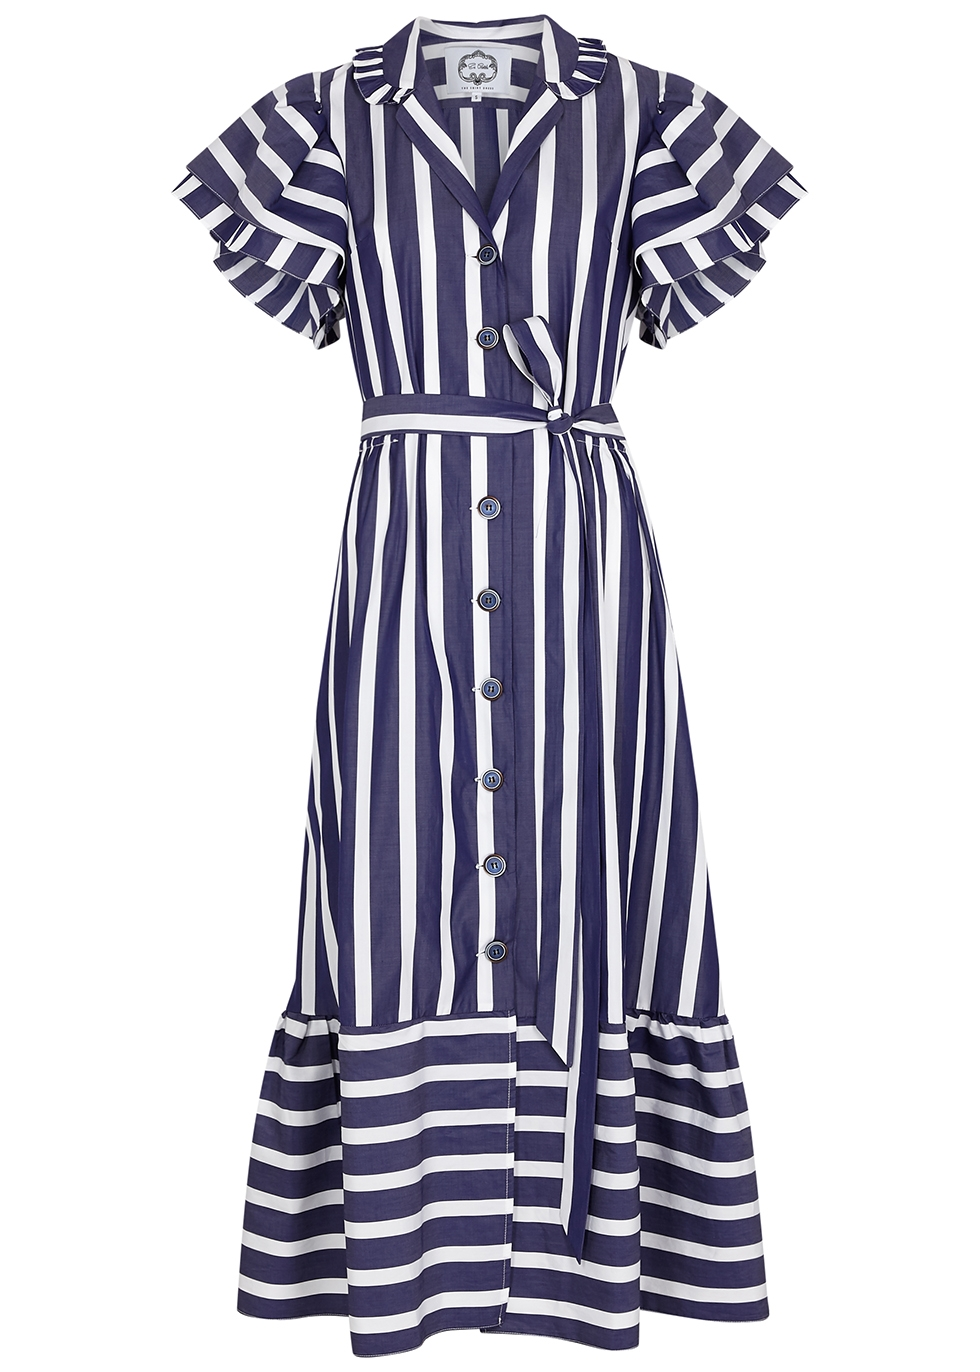 Navy striped cotton shirt dress